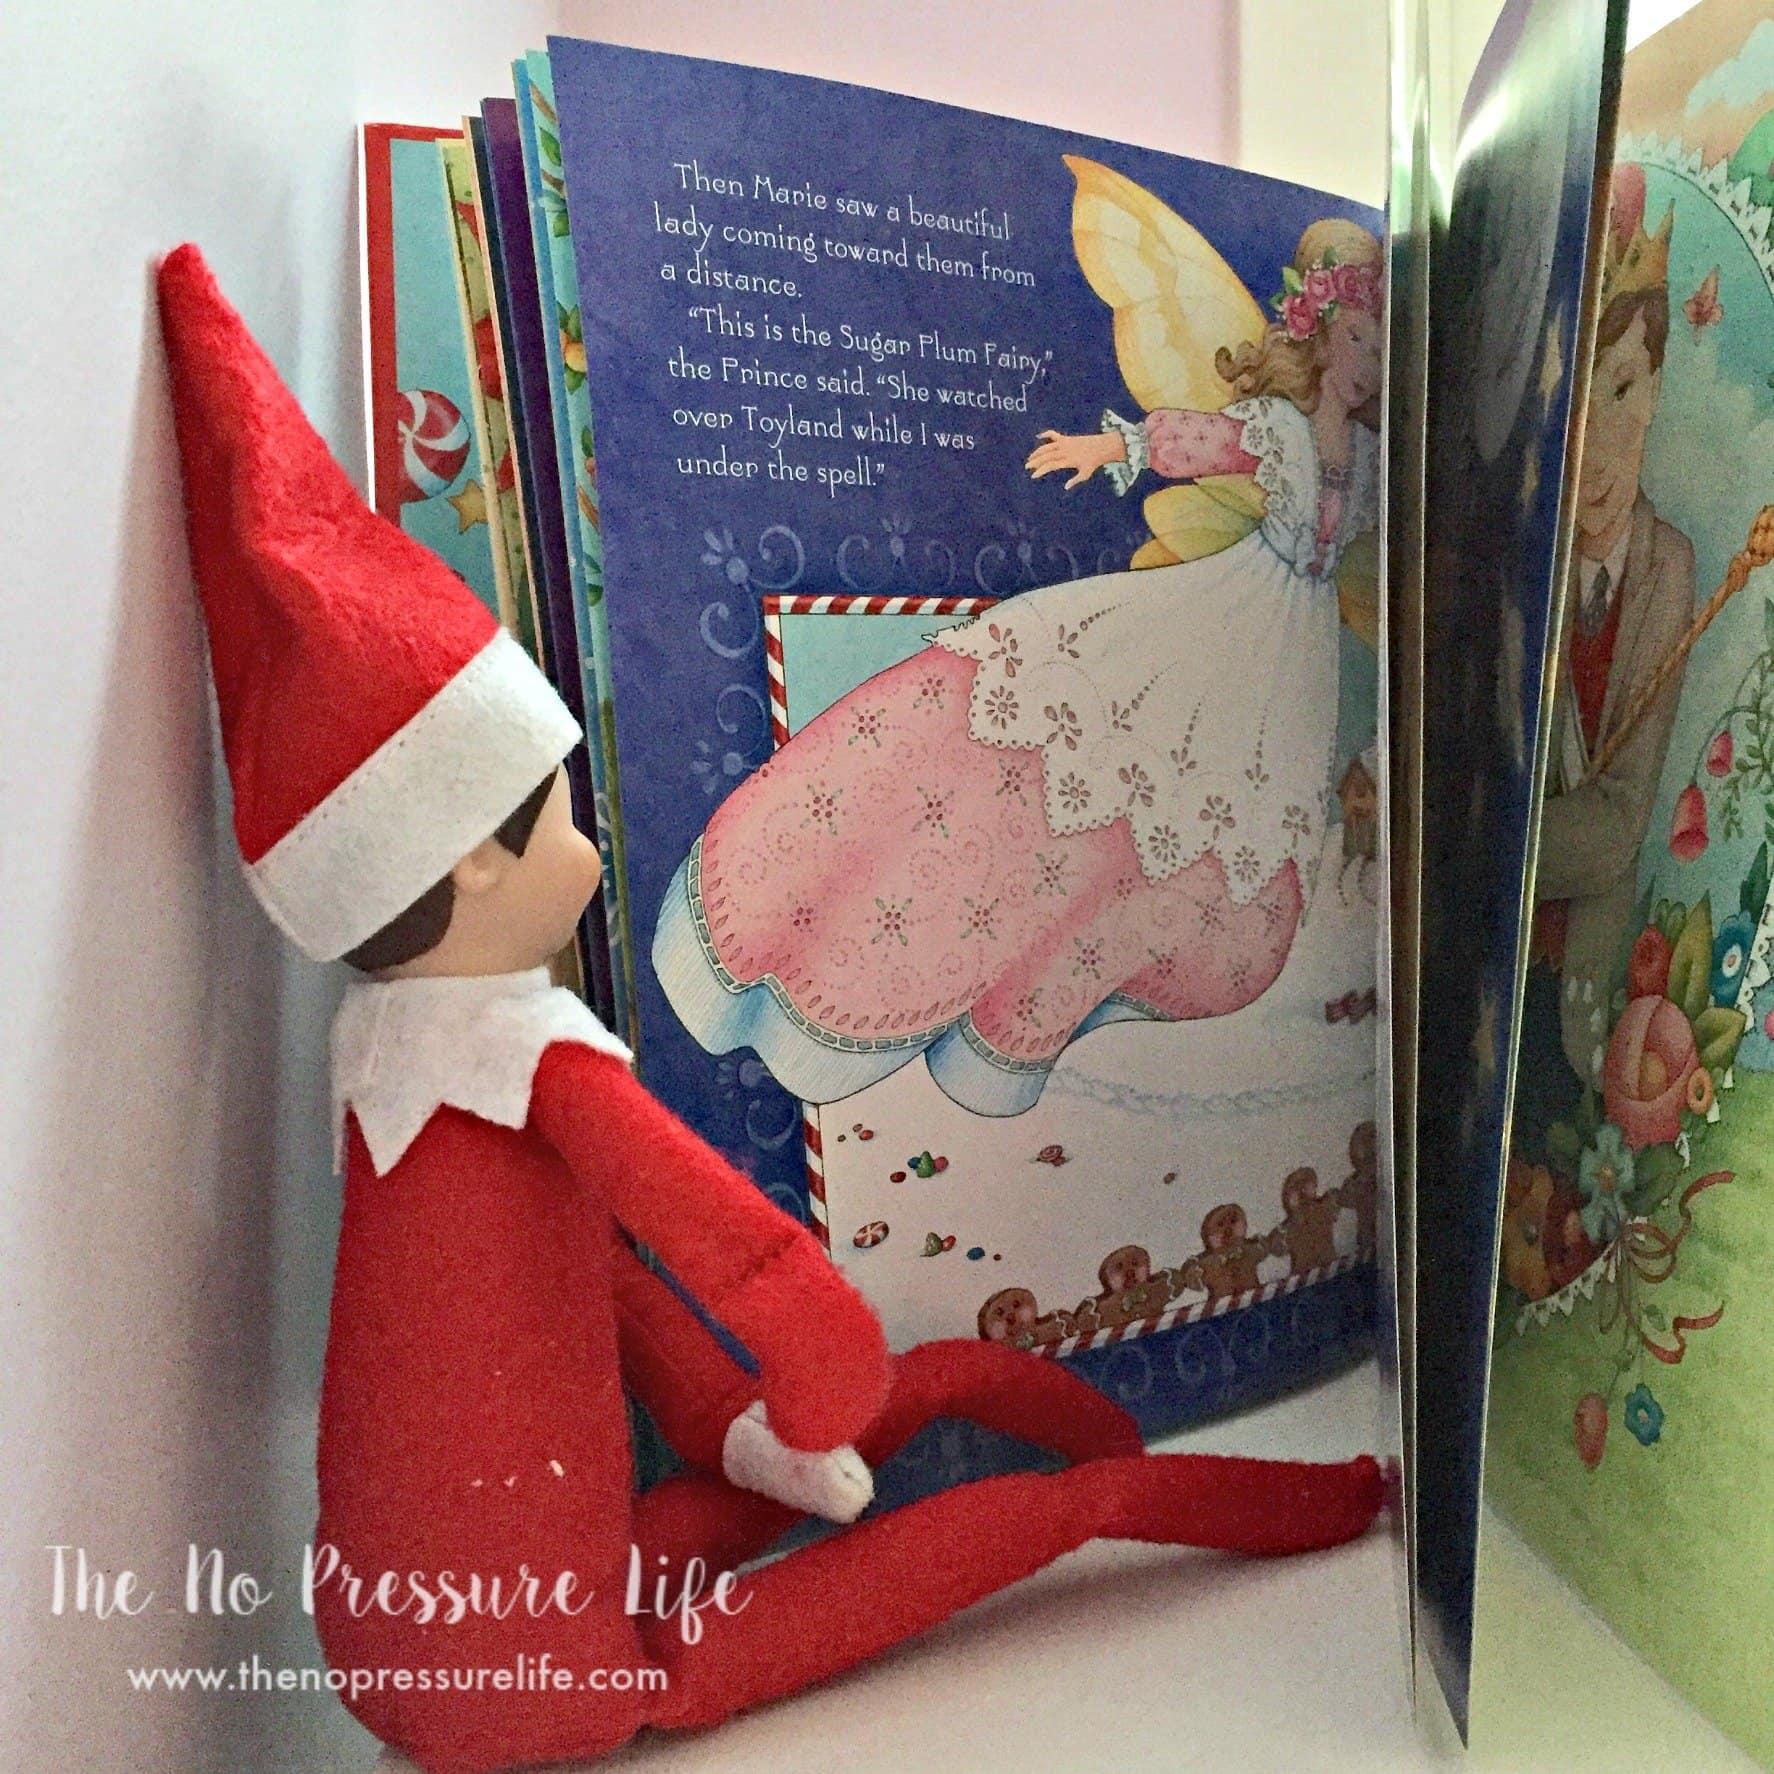 Easy Elf on the Shelf ideas: reading a book